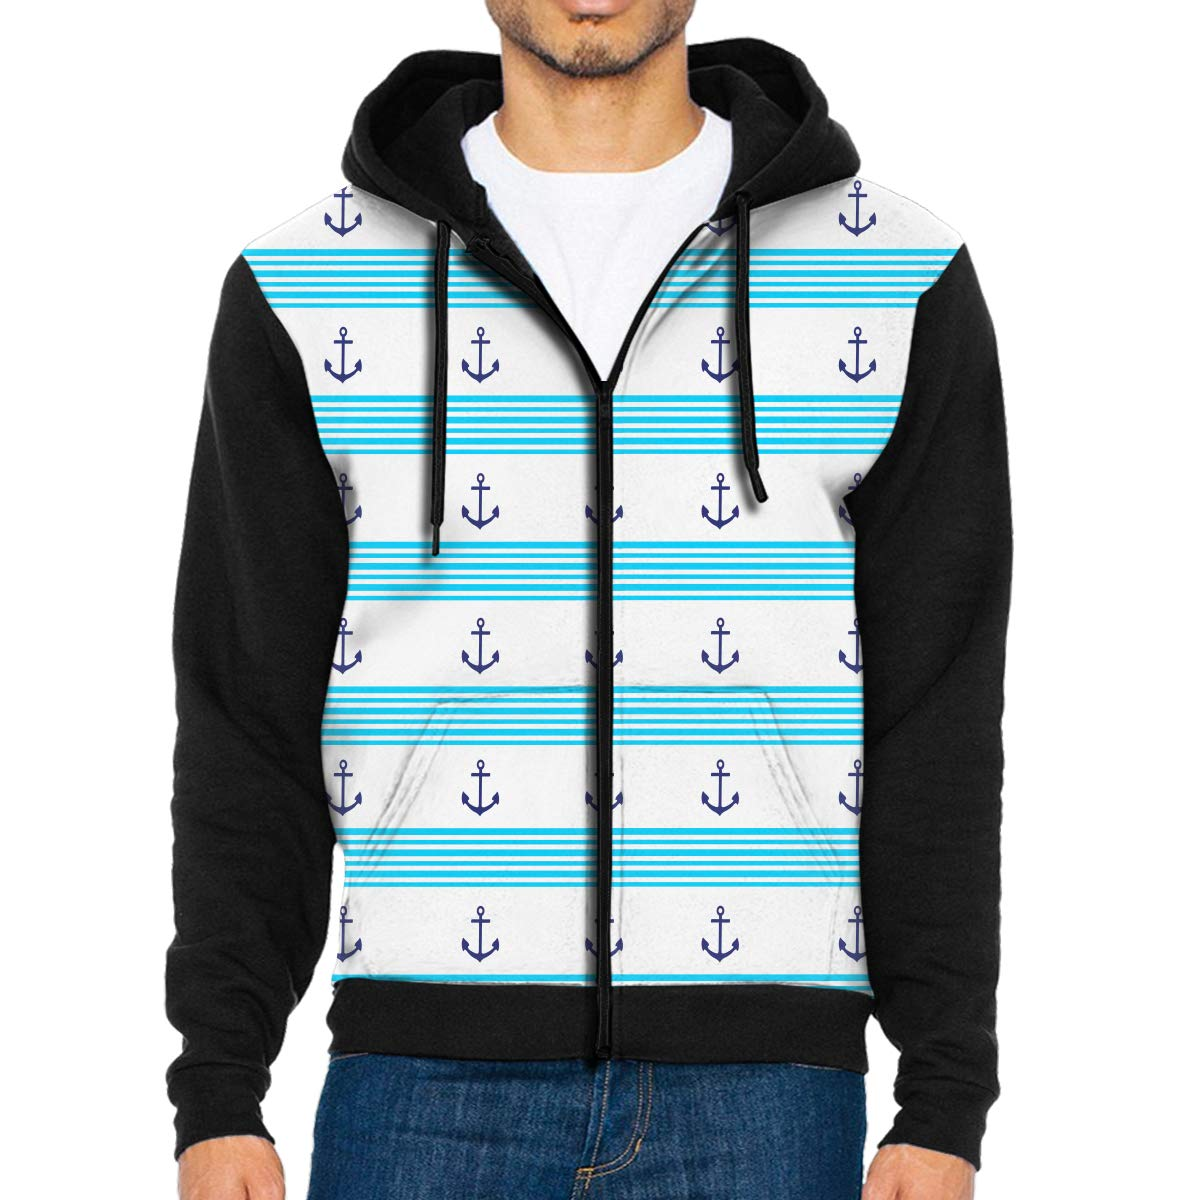 Mens Pullover Hood Windy Navy Anchor Zip Hoodies Hooded Fashion Jackets Coats